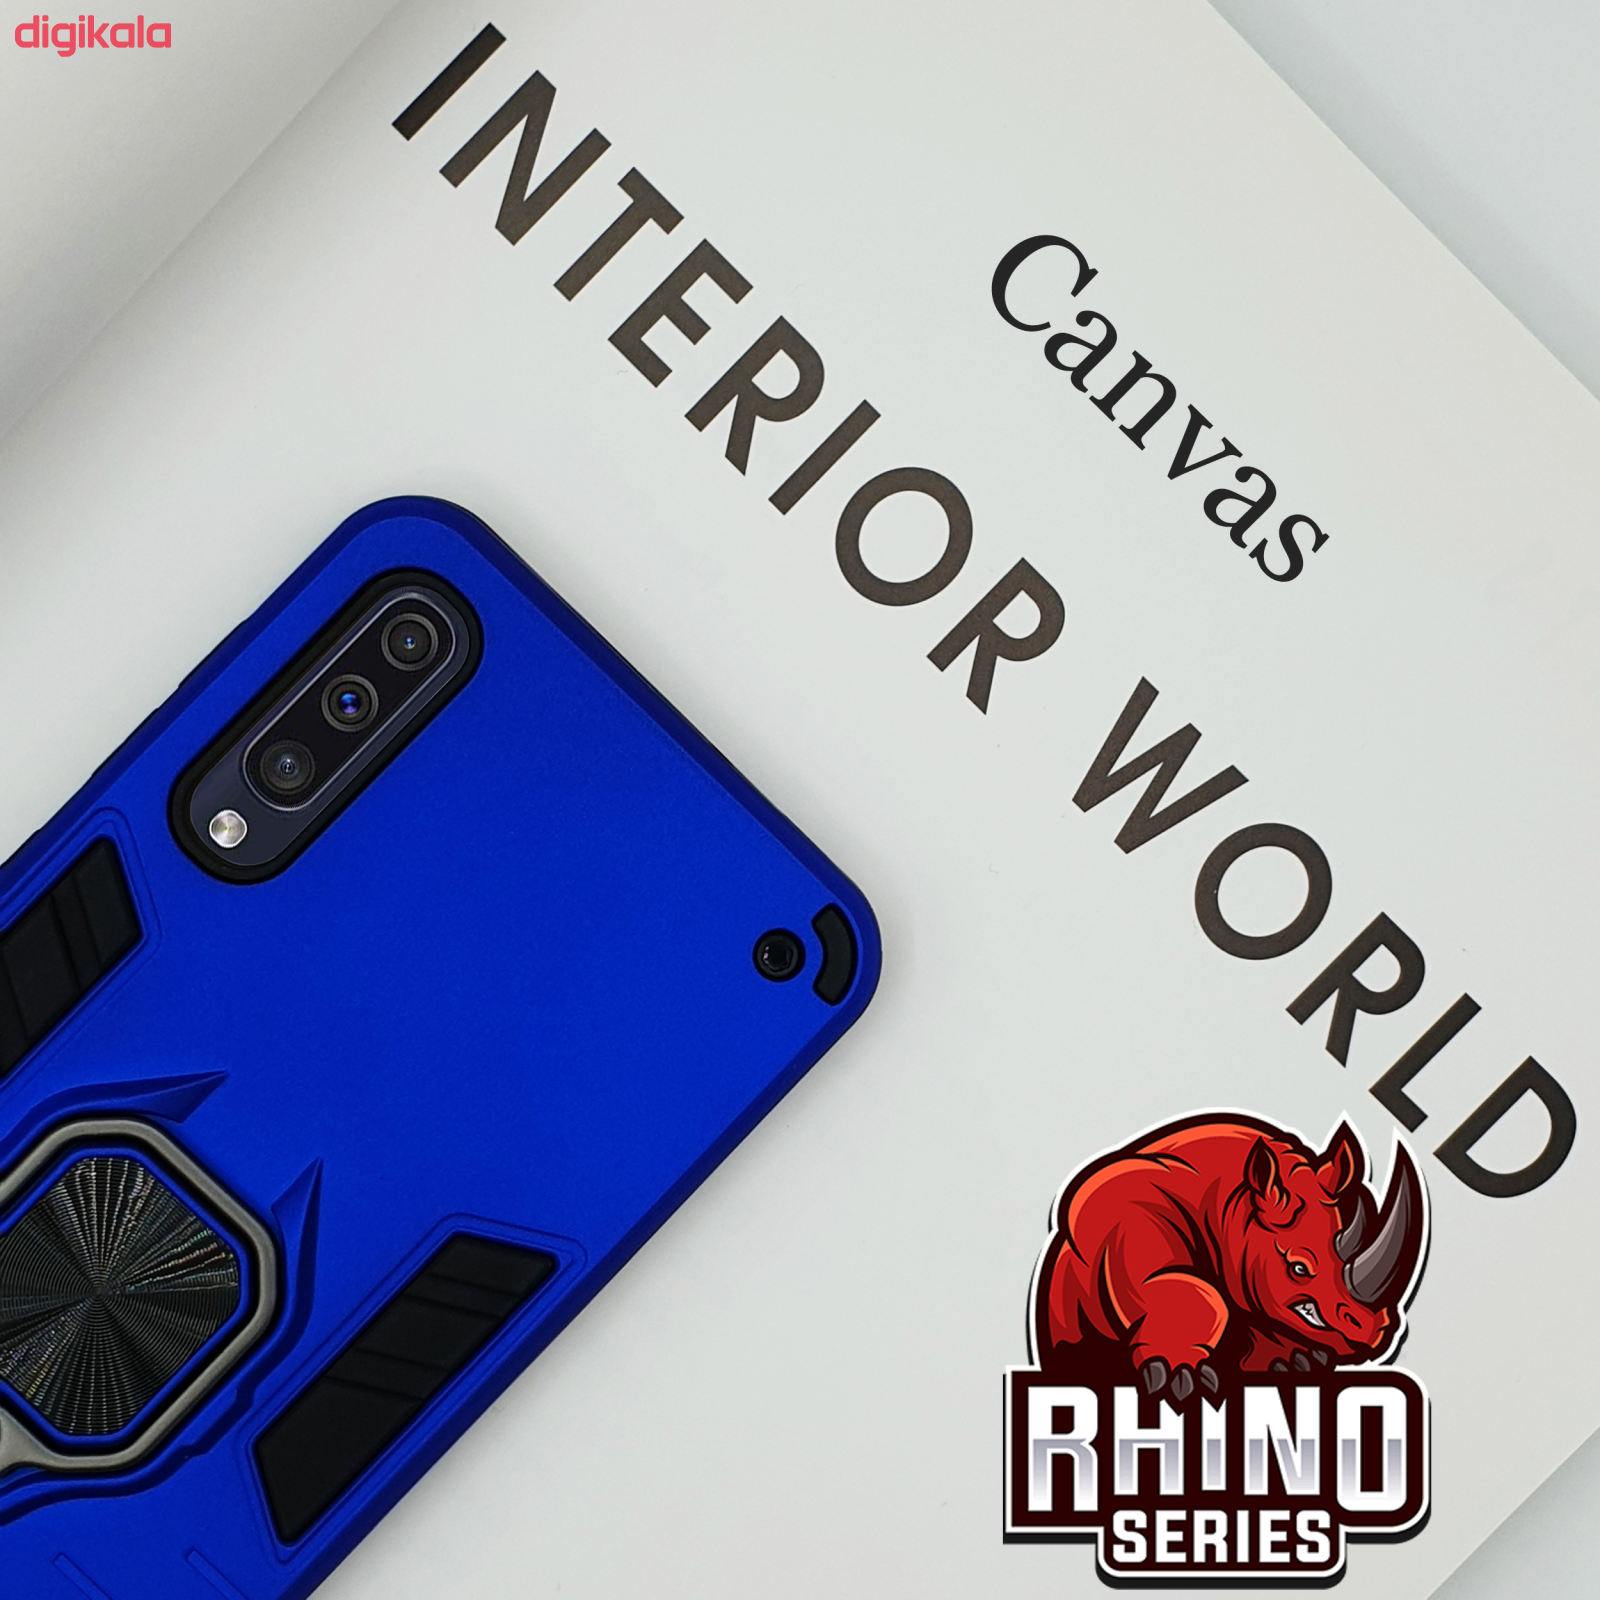 کاور کانواس مدل RHINO SERIES مناسب برای گوشی موبایل سامسونگ Galaxy A50s/A30s/A50 main 1 2